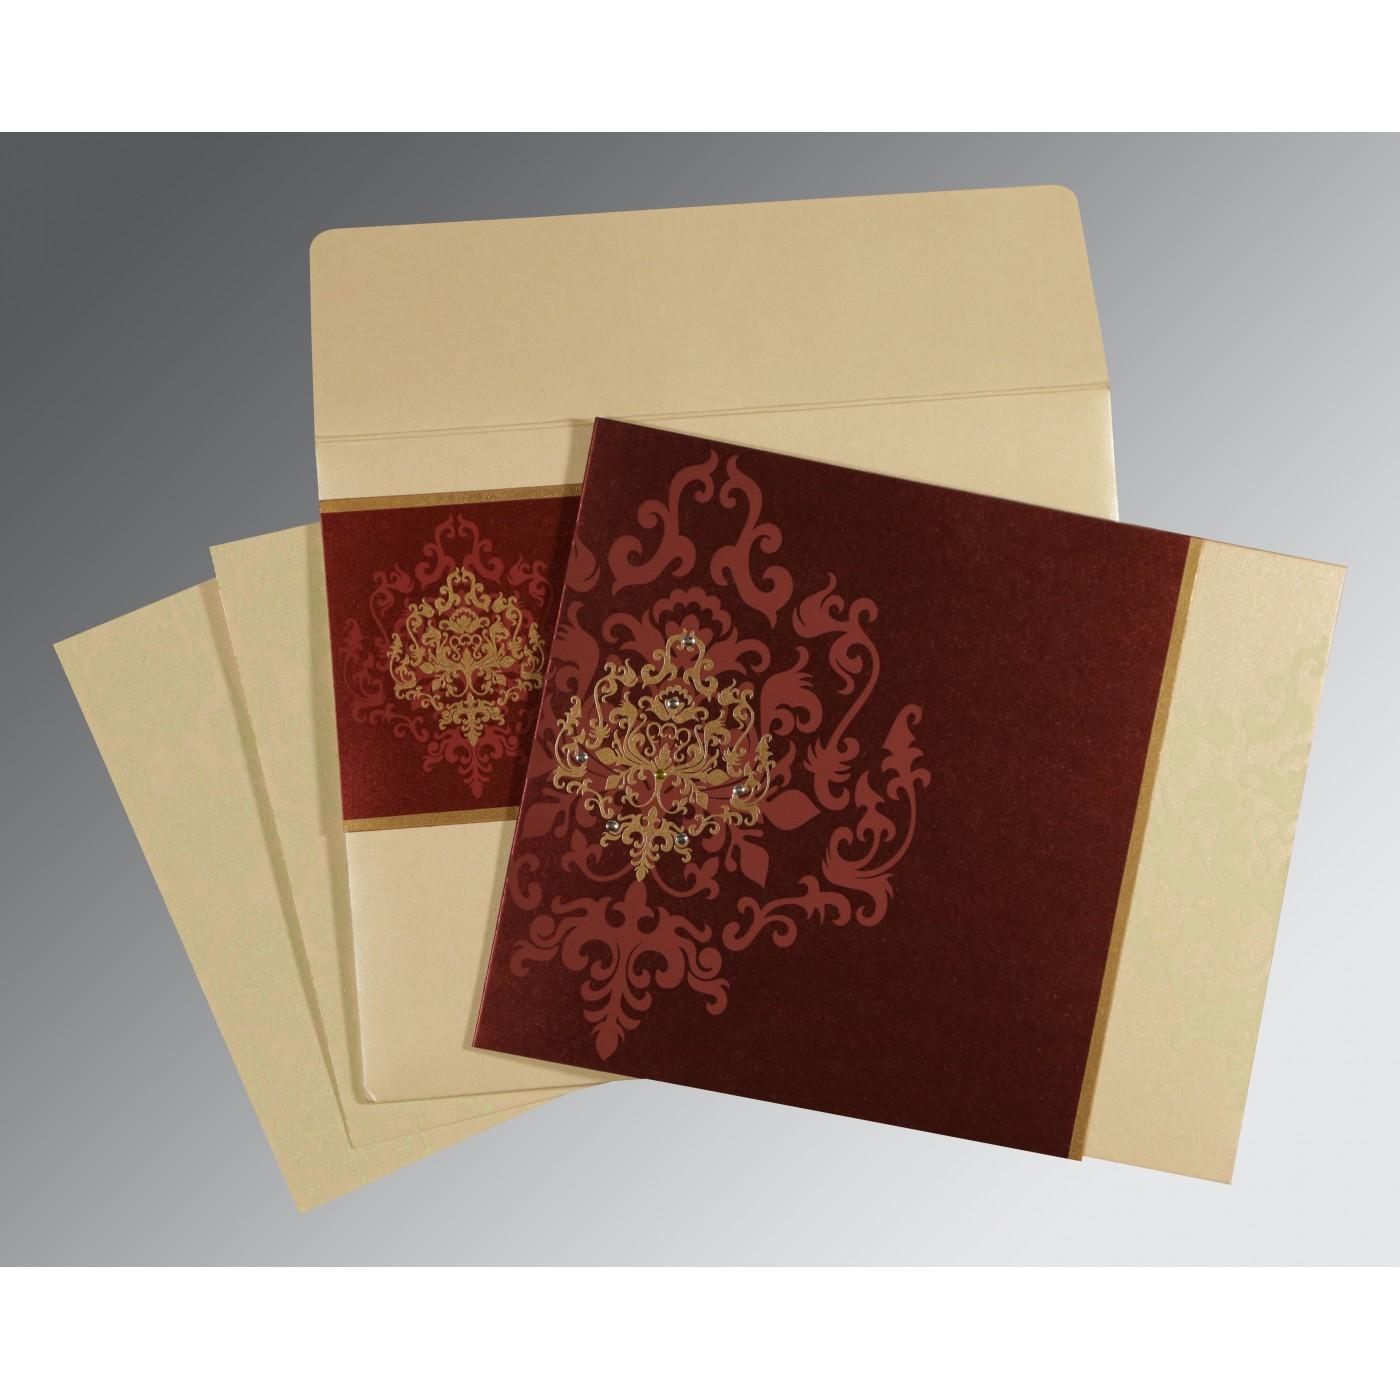 DERBY BROWN SHIMMERY DAMASK THEMED - SCREEN PRINTED WEDDING CARD : IN-8253F - 123WeddingCards